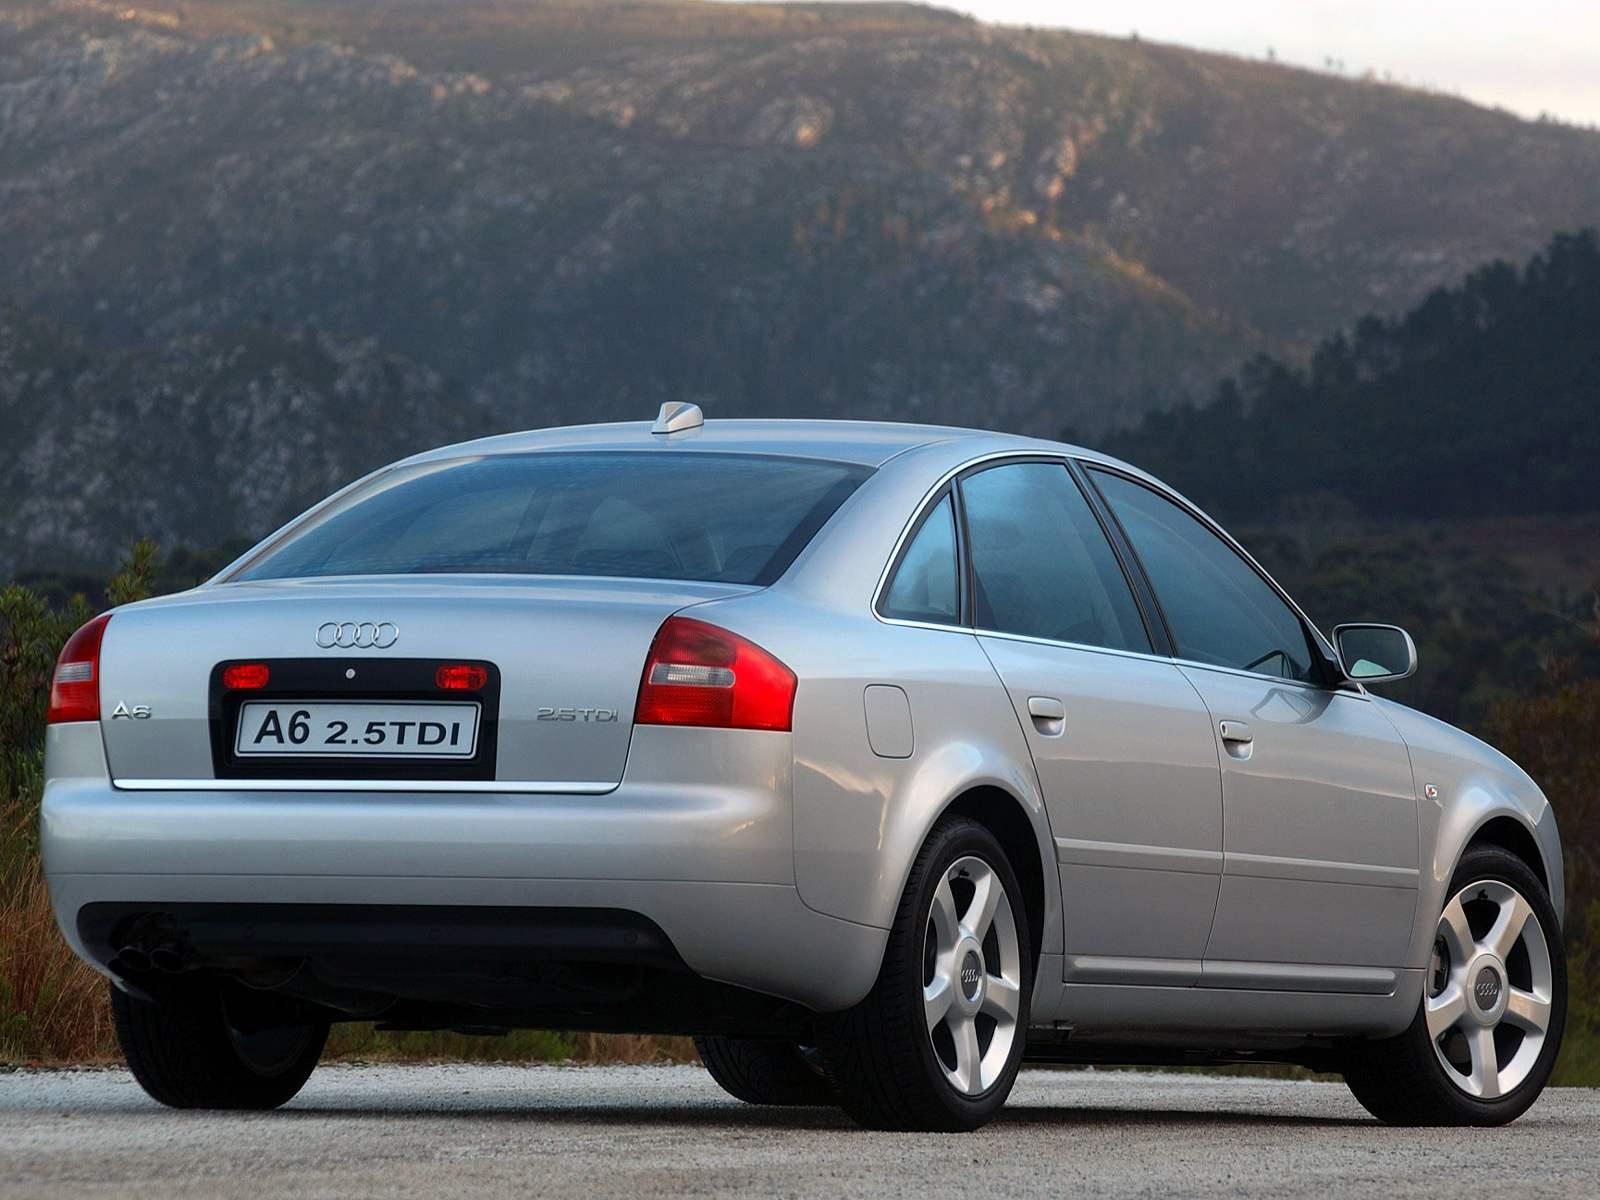 Седан AUDI А6 выпуска 2004 года